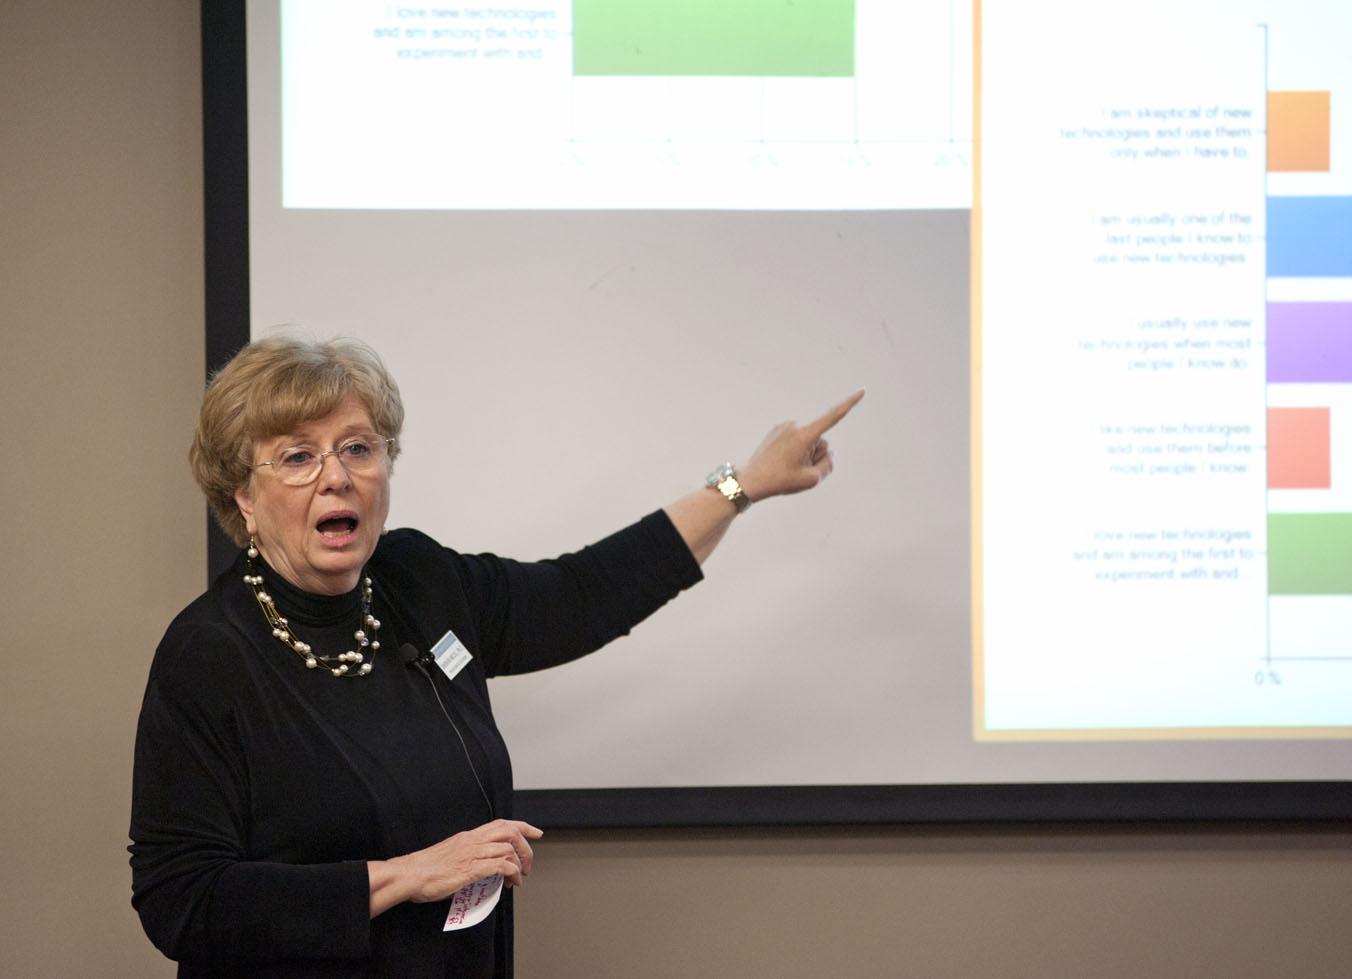 instructional technology graduate programs